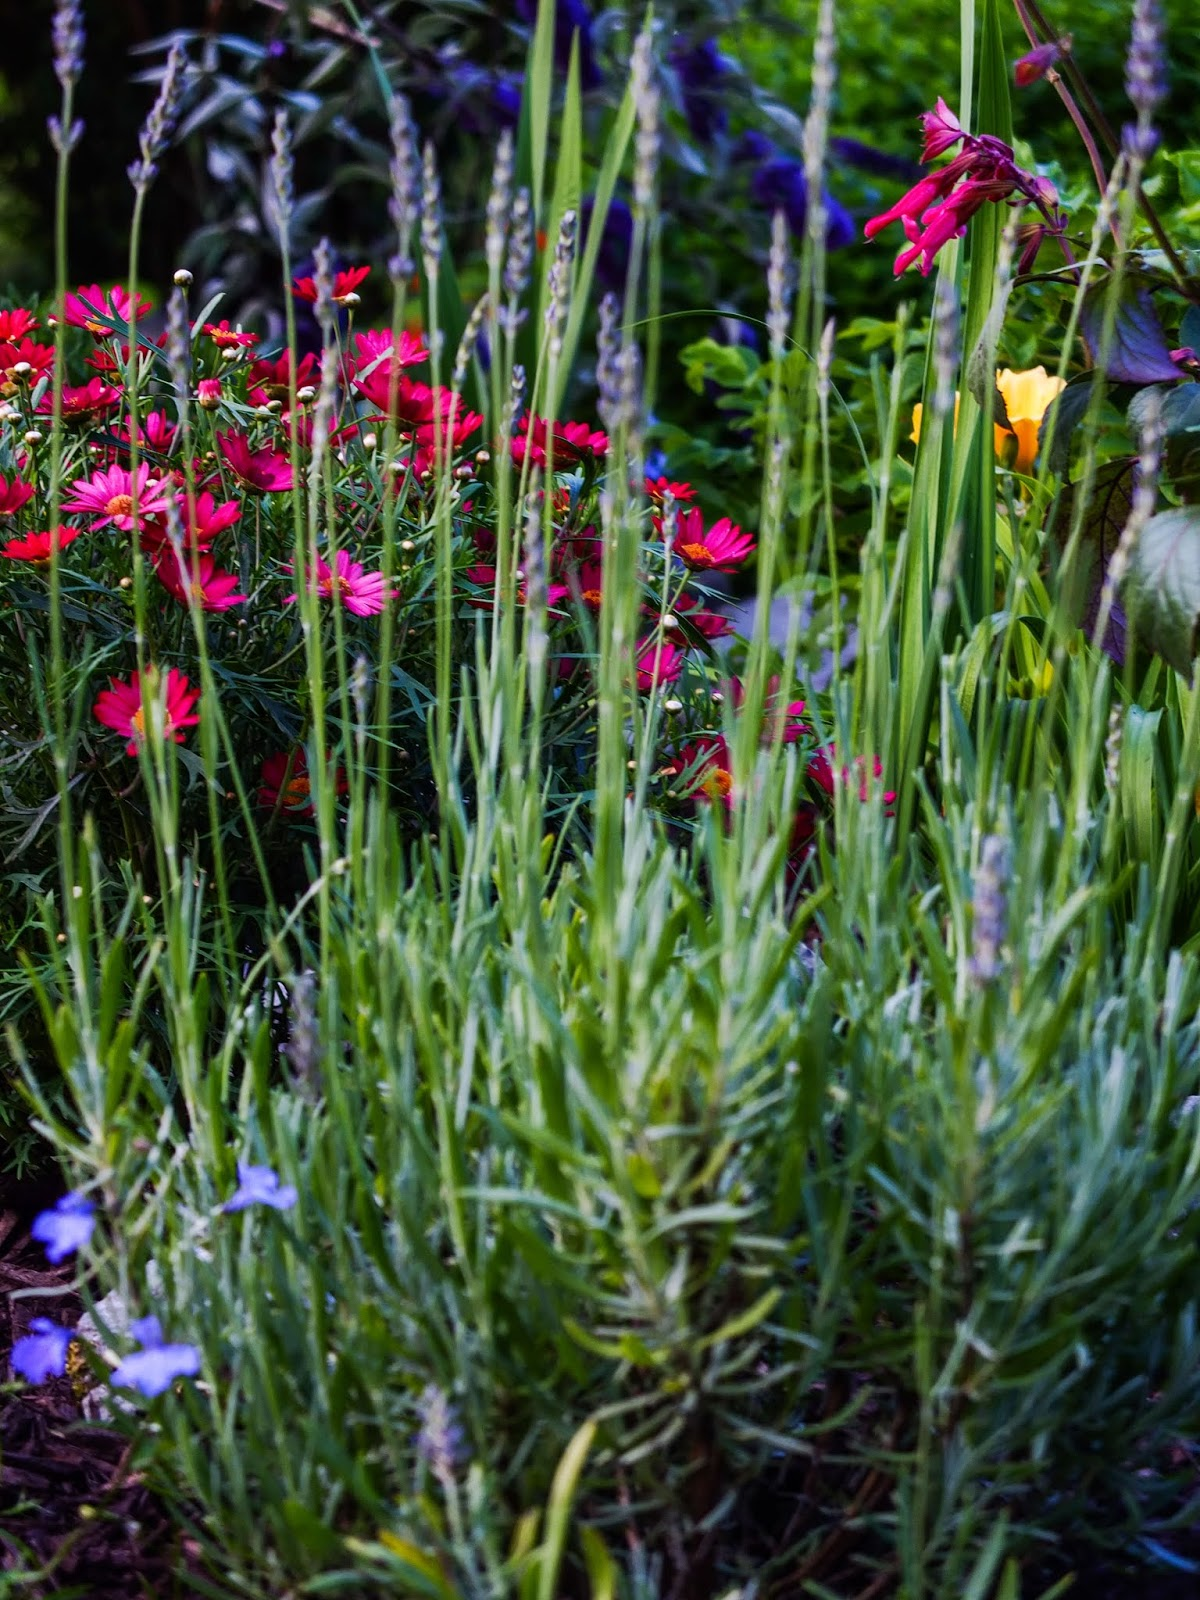 Lavender bush in the garden.